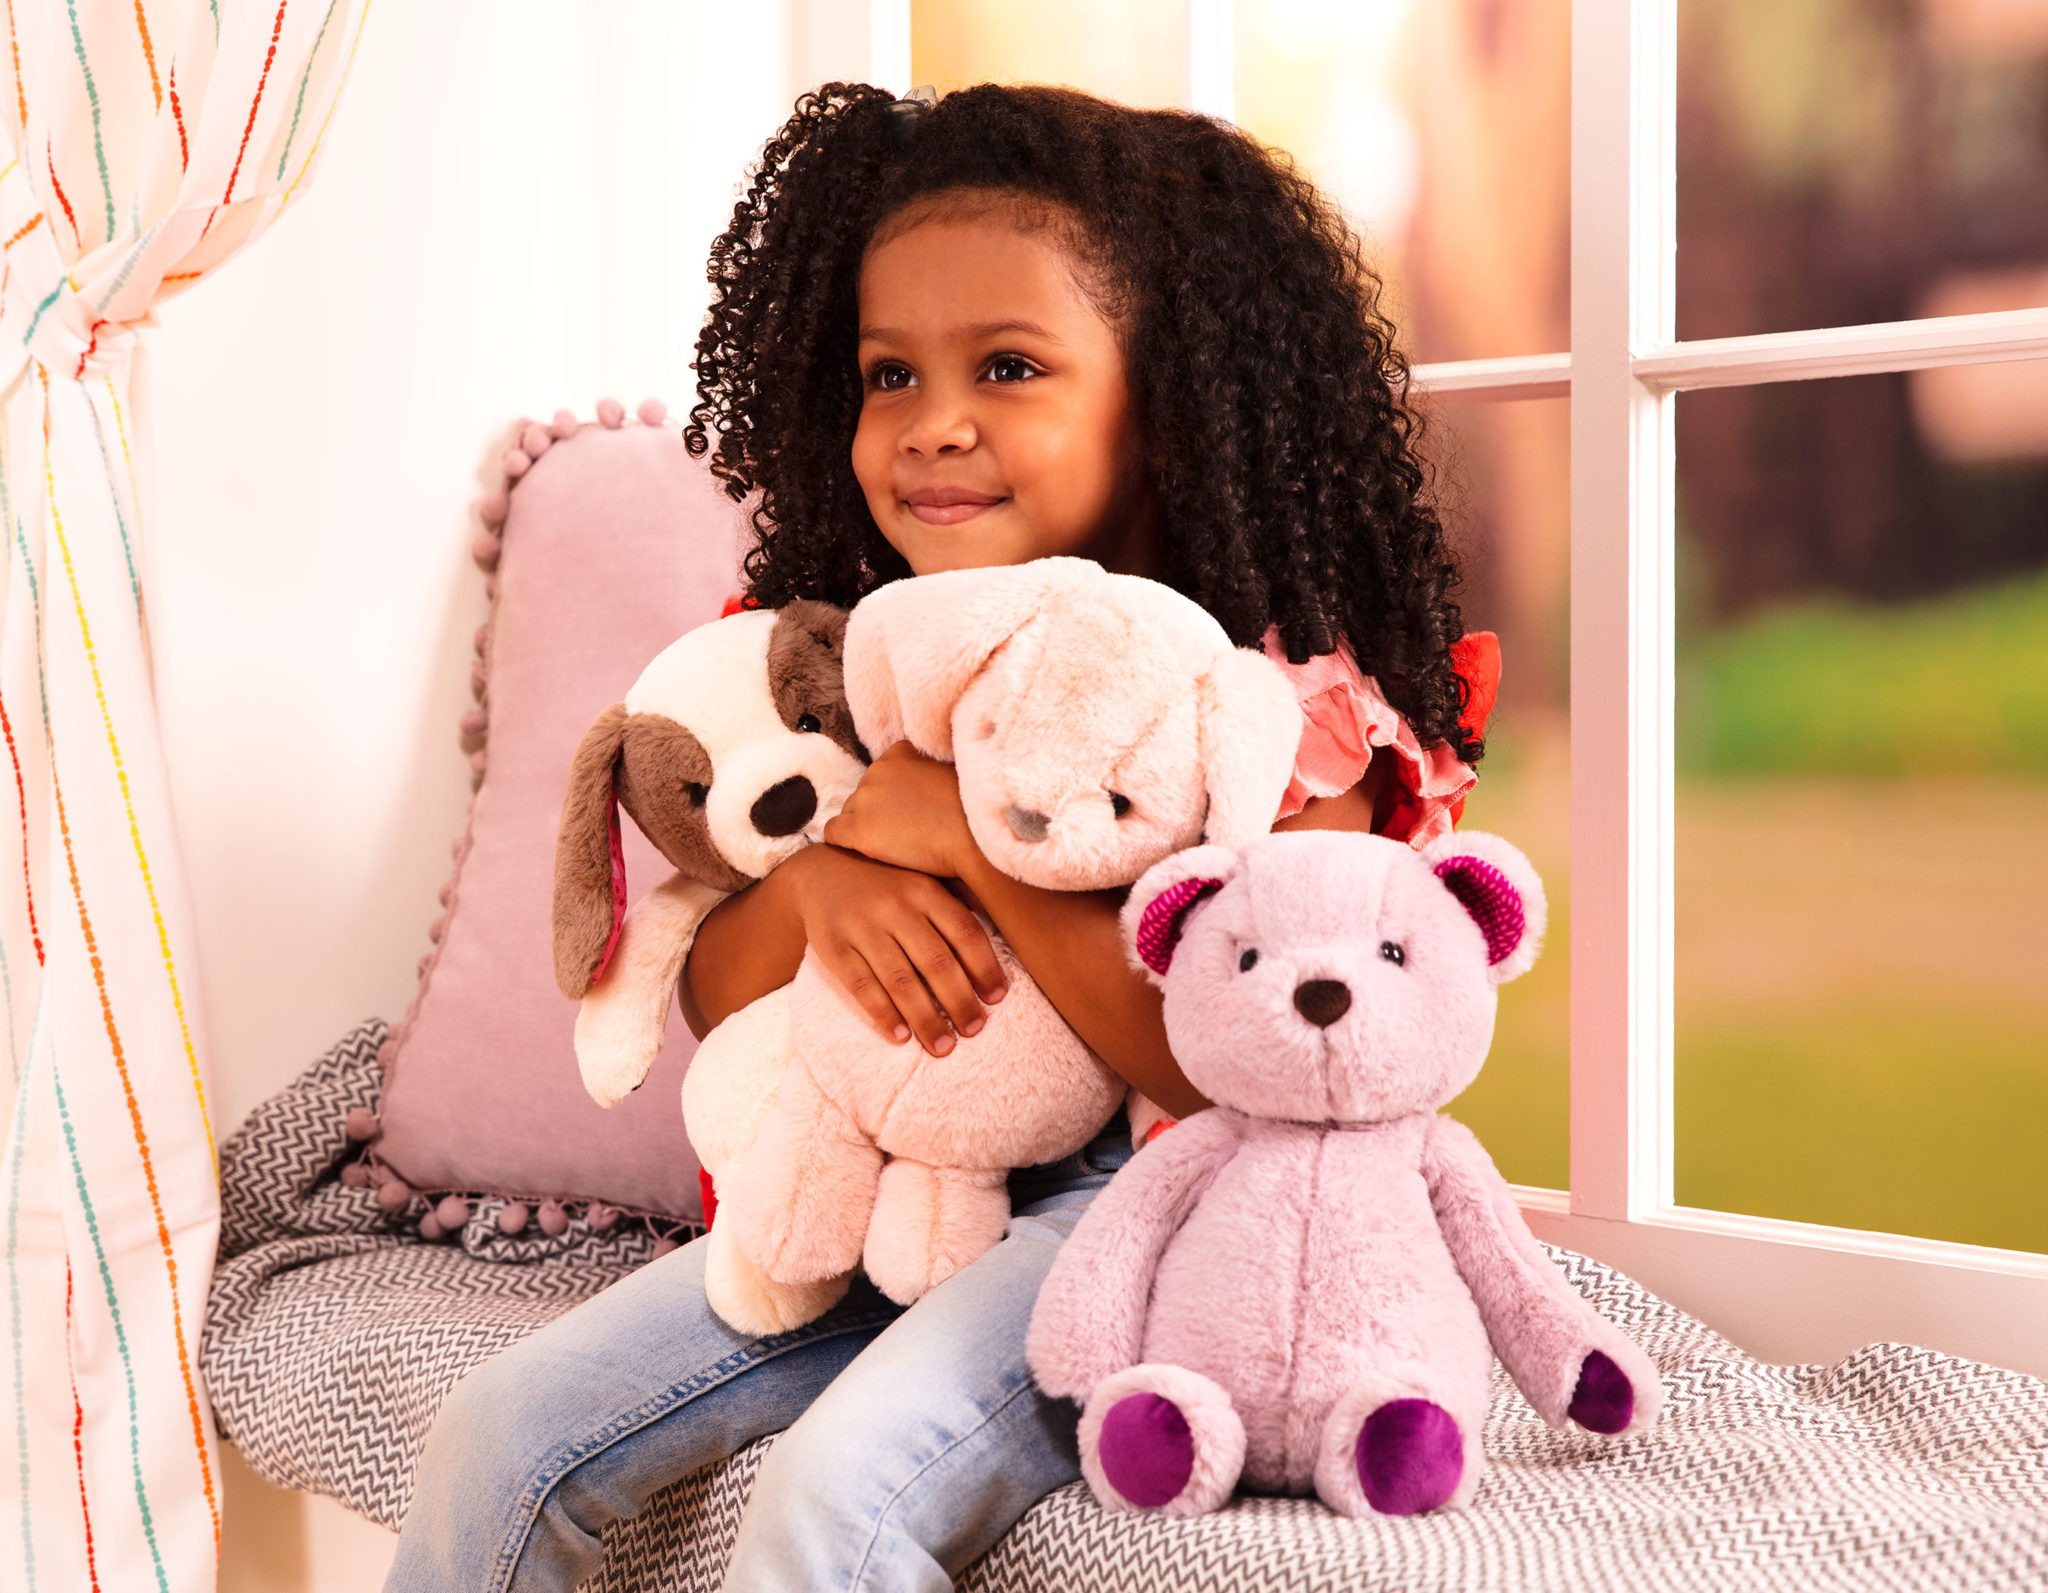 Girl and three stuffed animal toys.